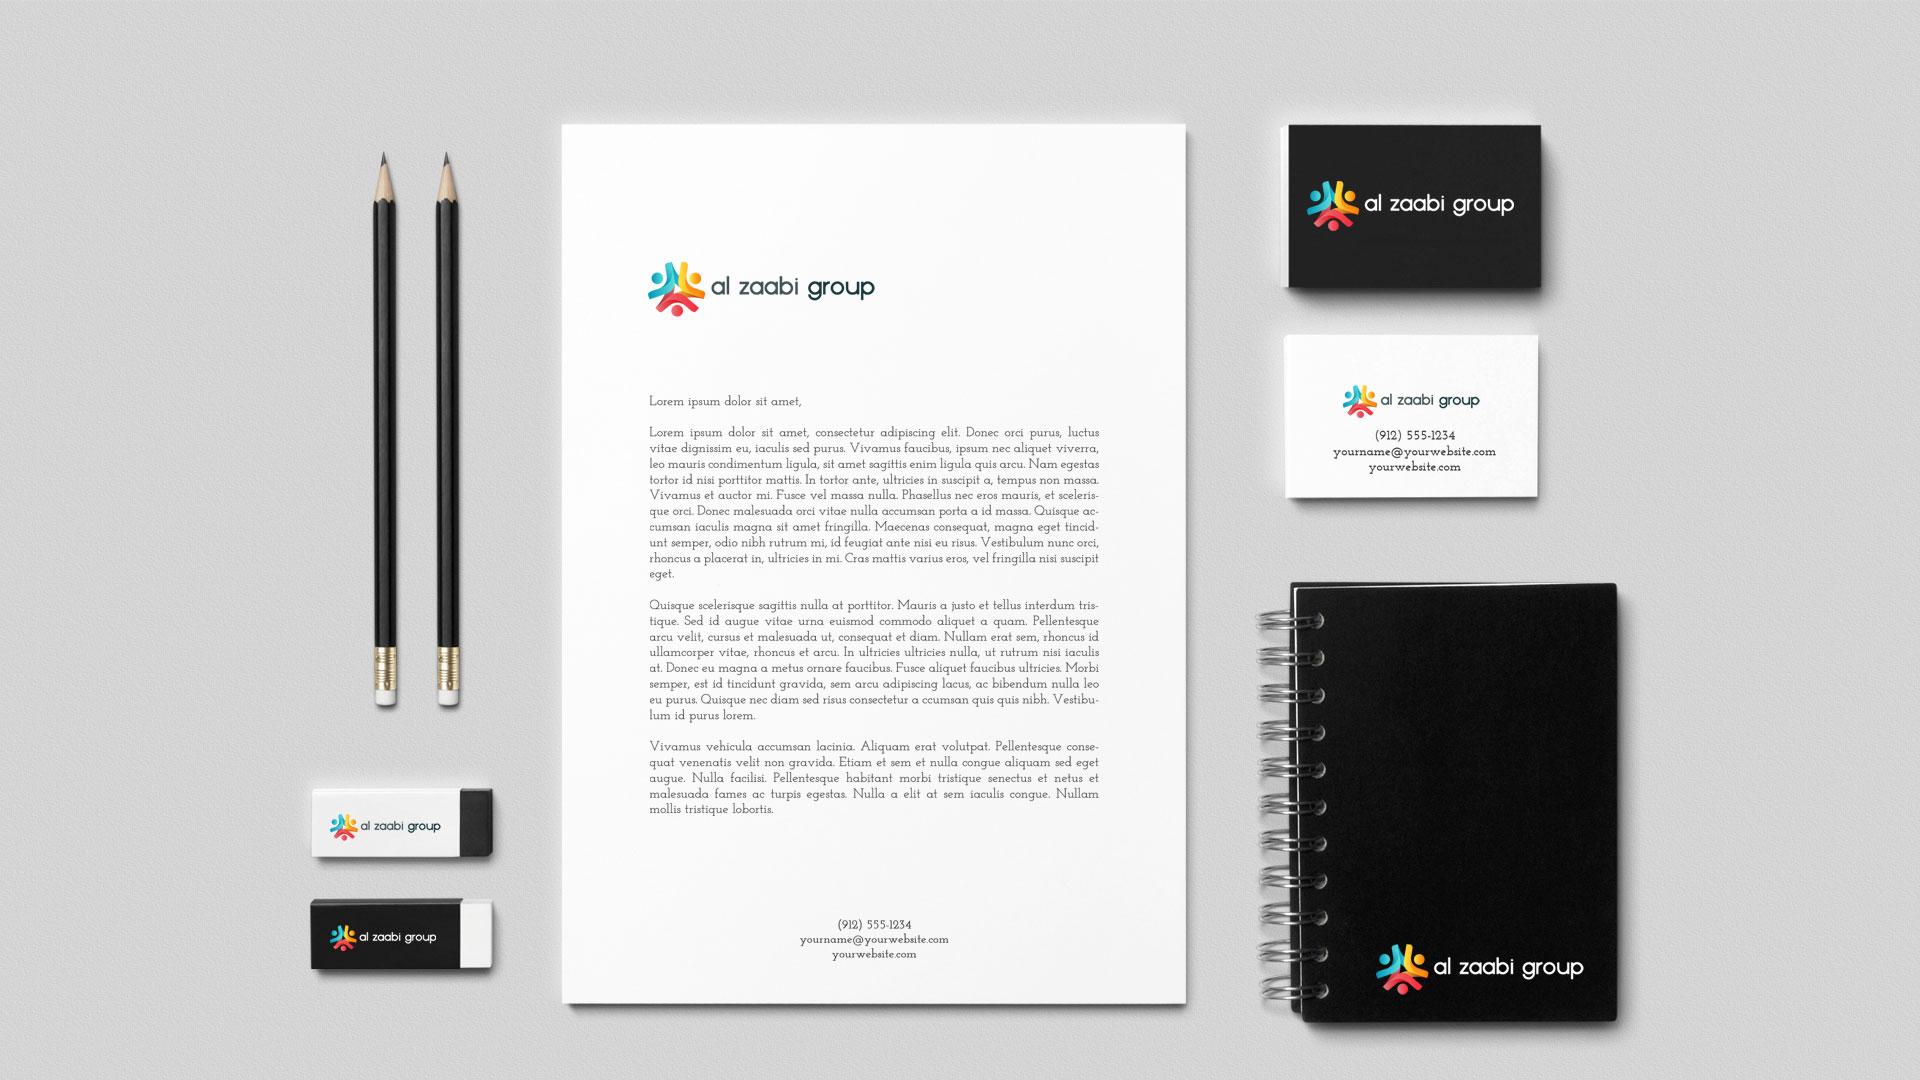 Al Zaabi Group Abu Dhabi Branding Letterhead Visiting Card Design Presentation